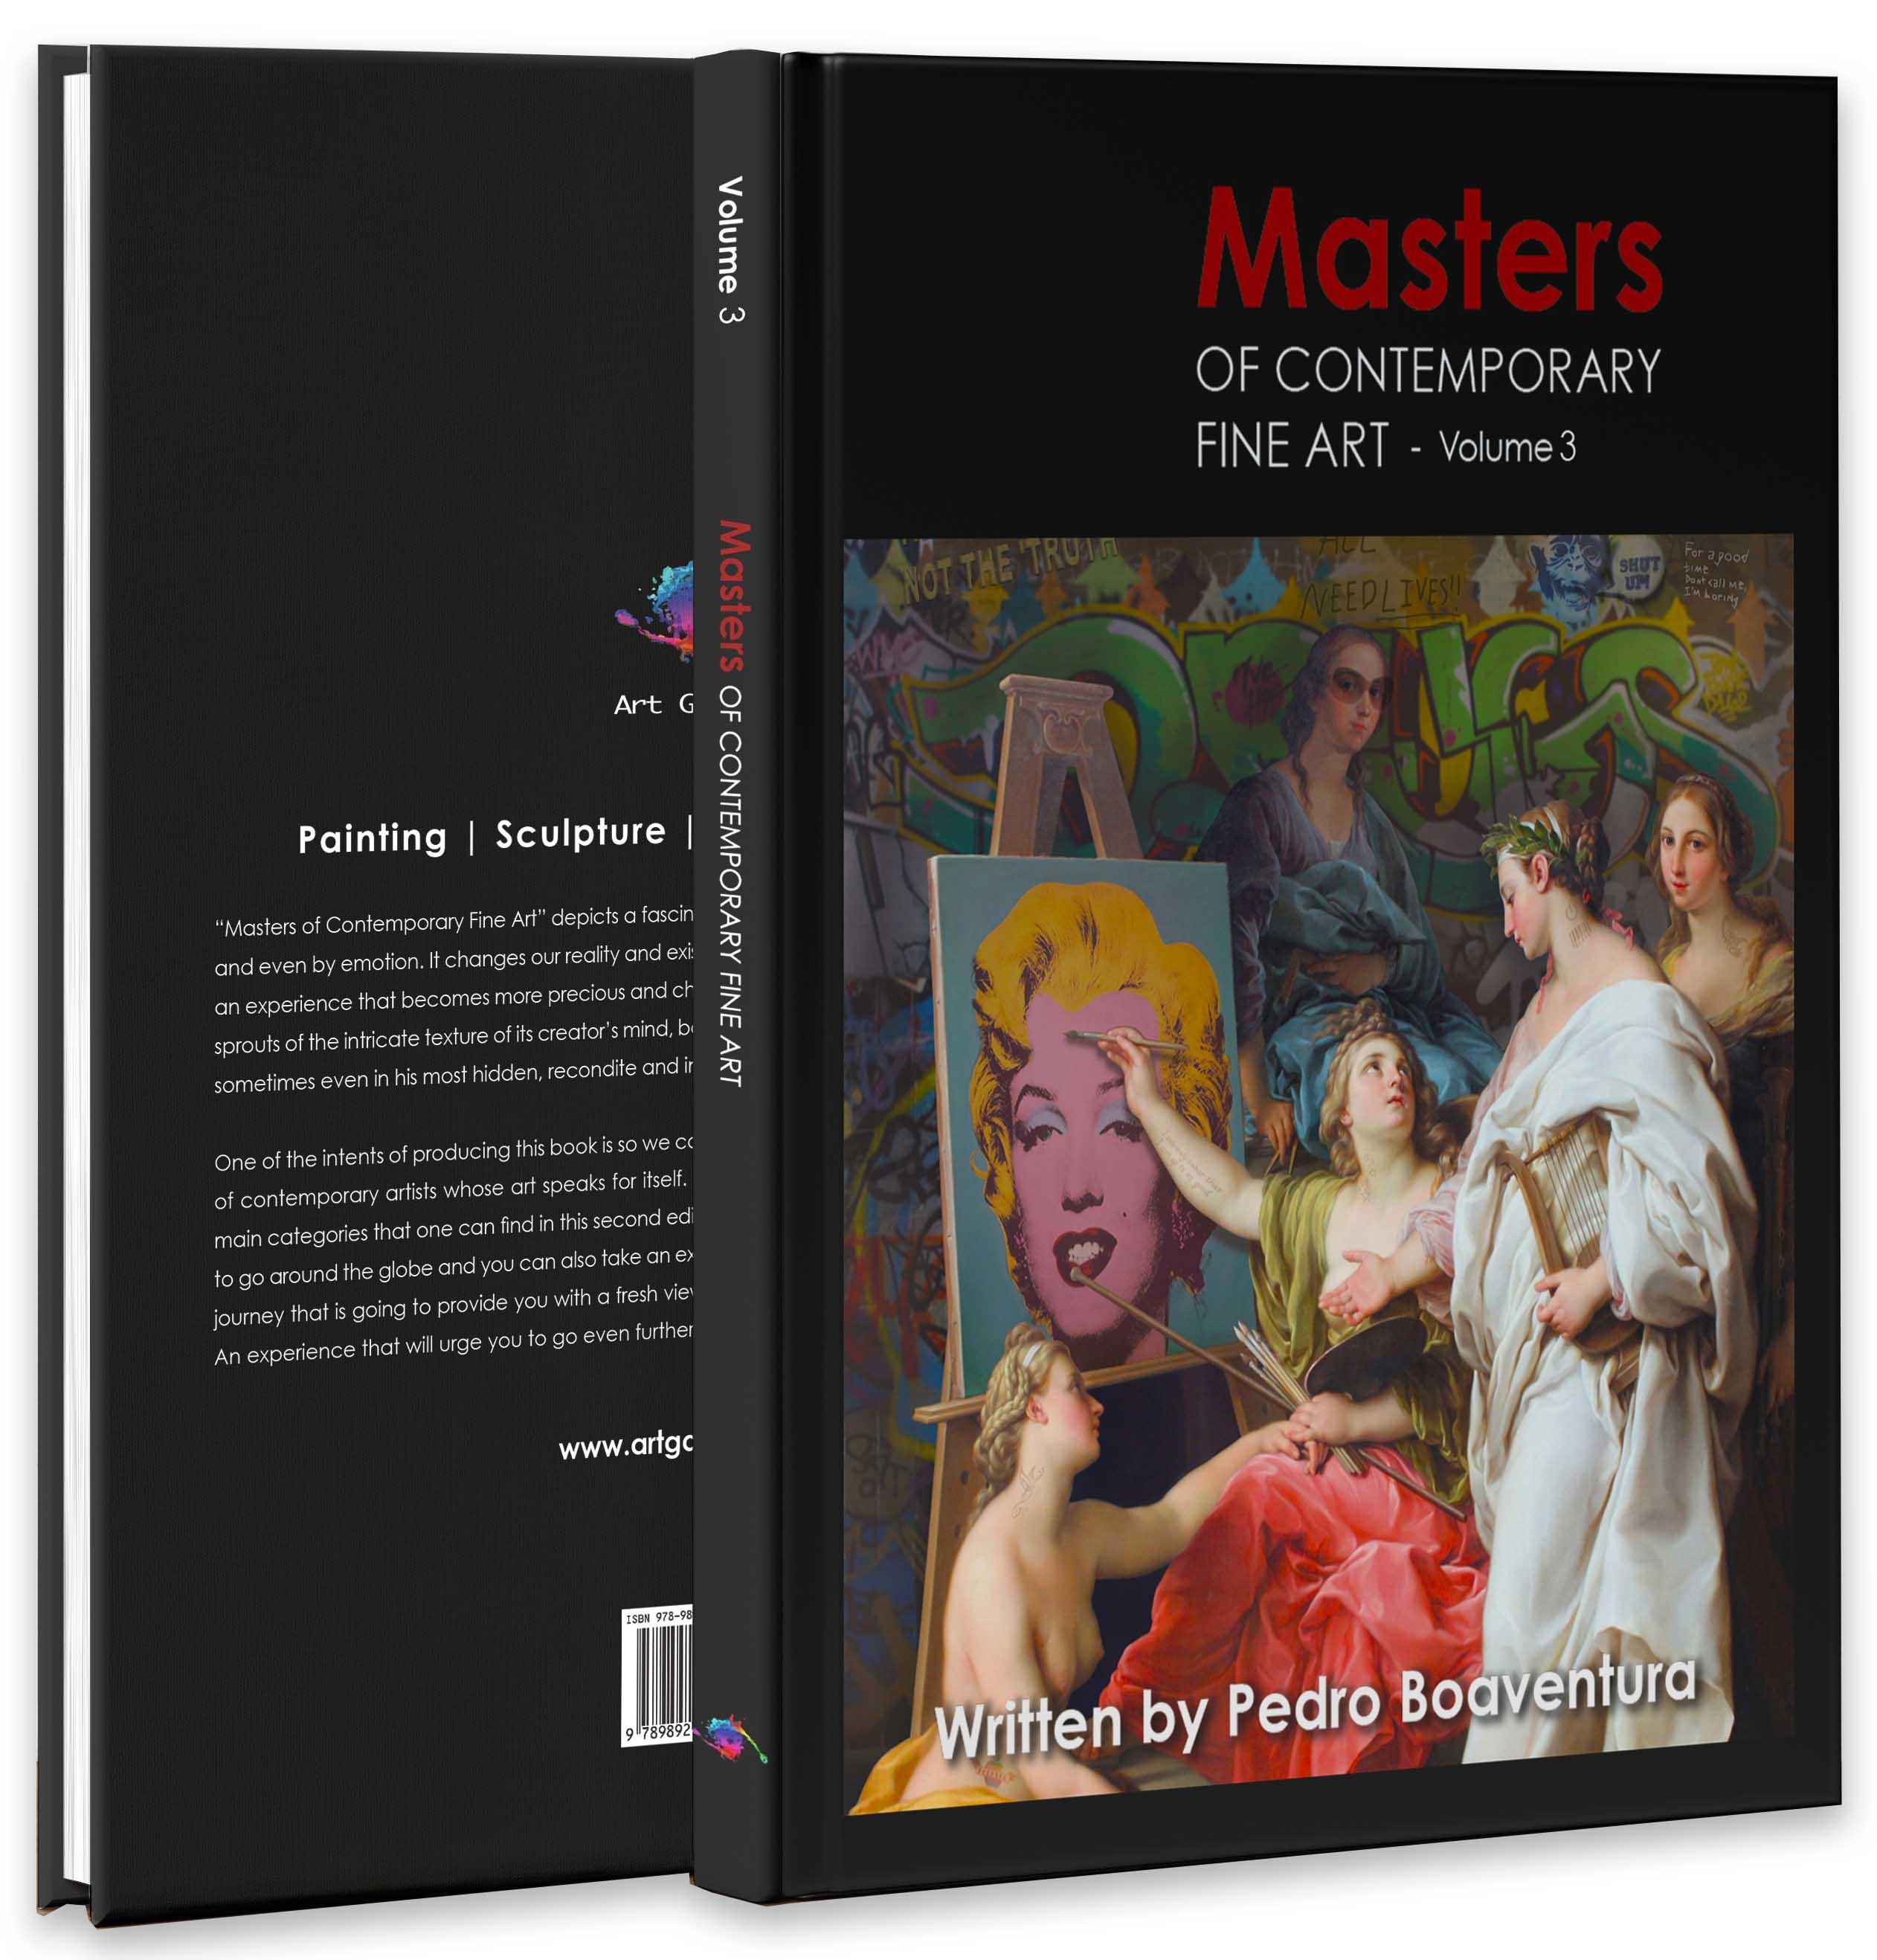 publication-book-image_6842.jpg